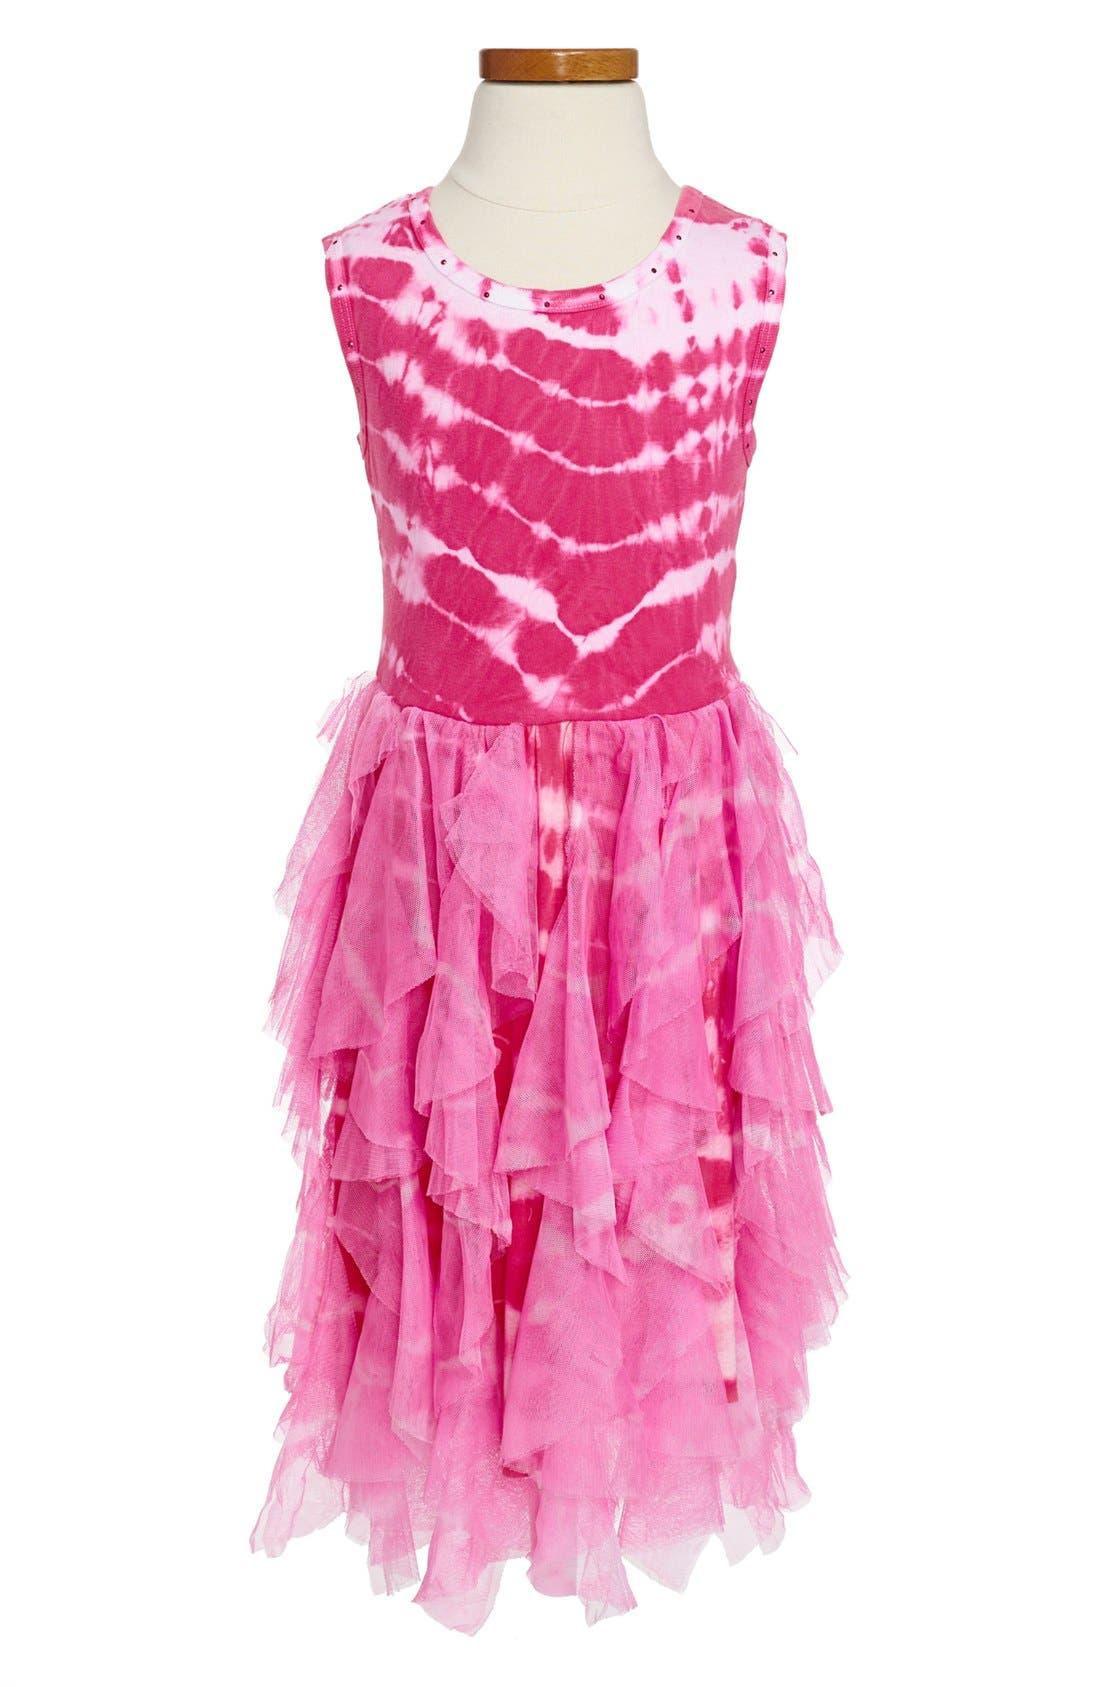 Main Image - Mignone Tie Dye Dress (Little Girls & Big Girls)